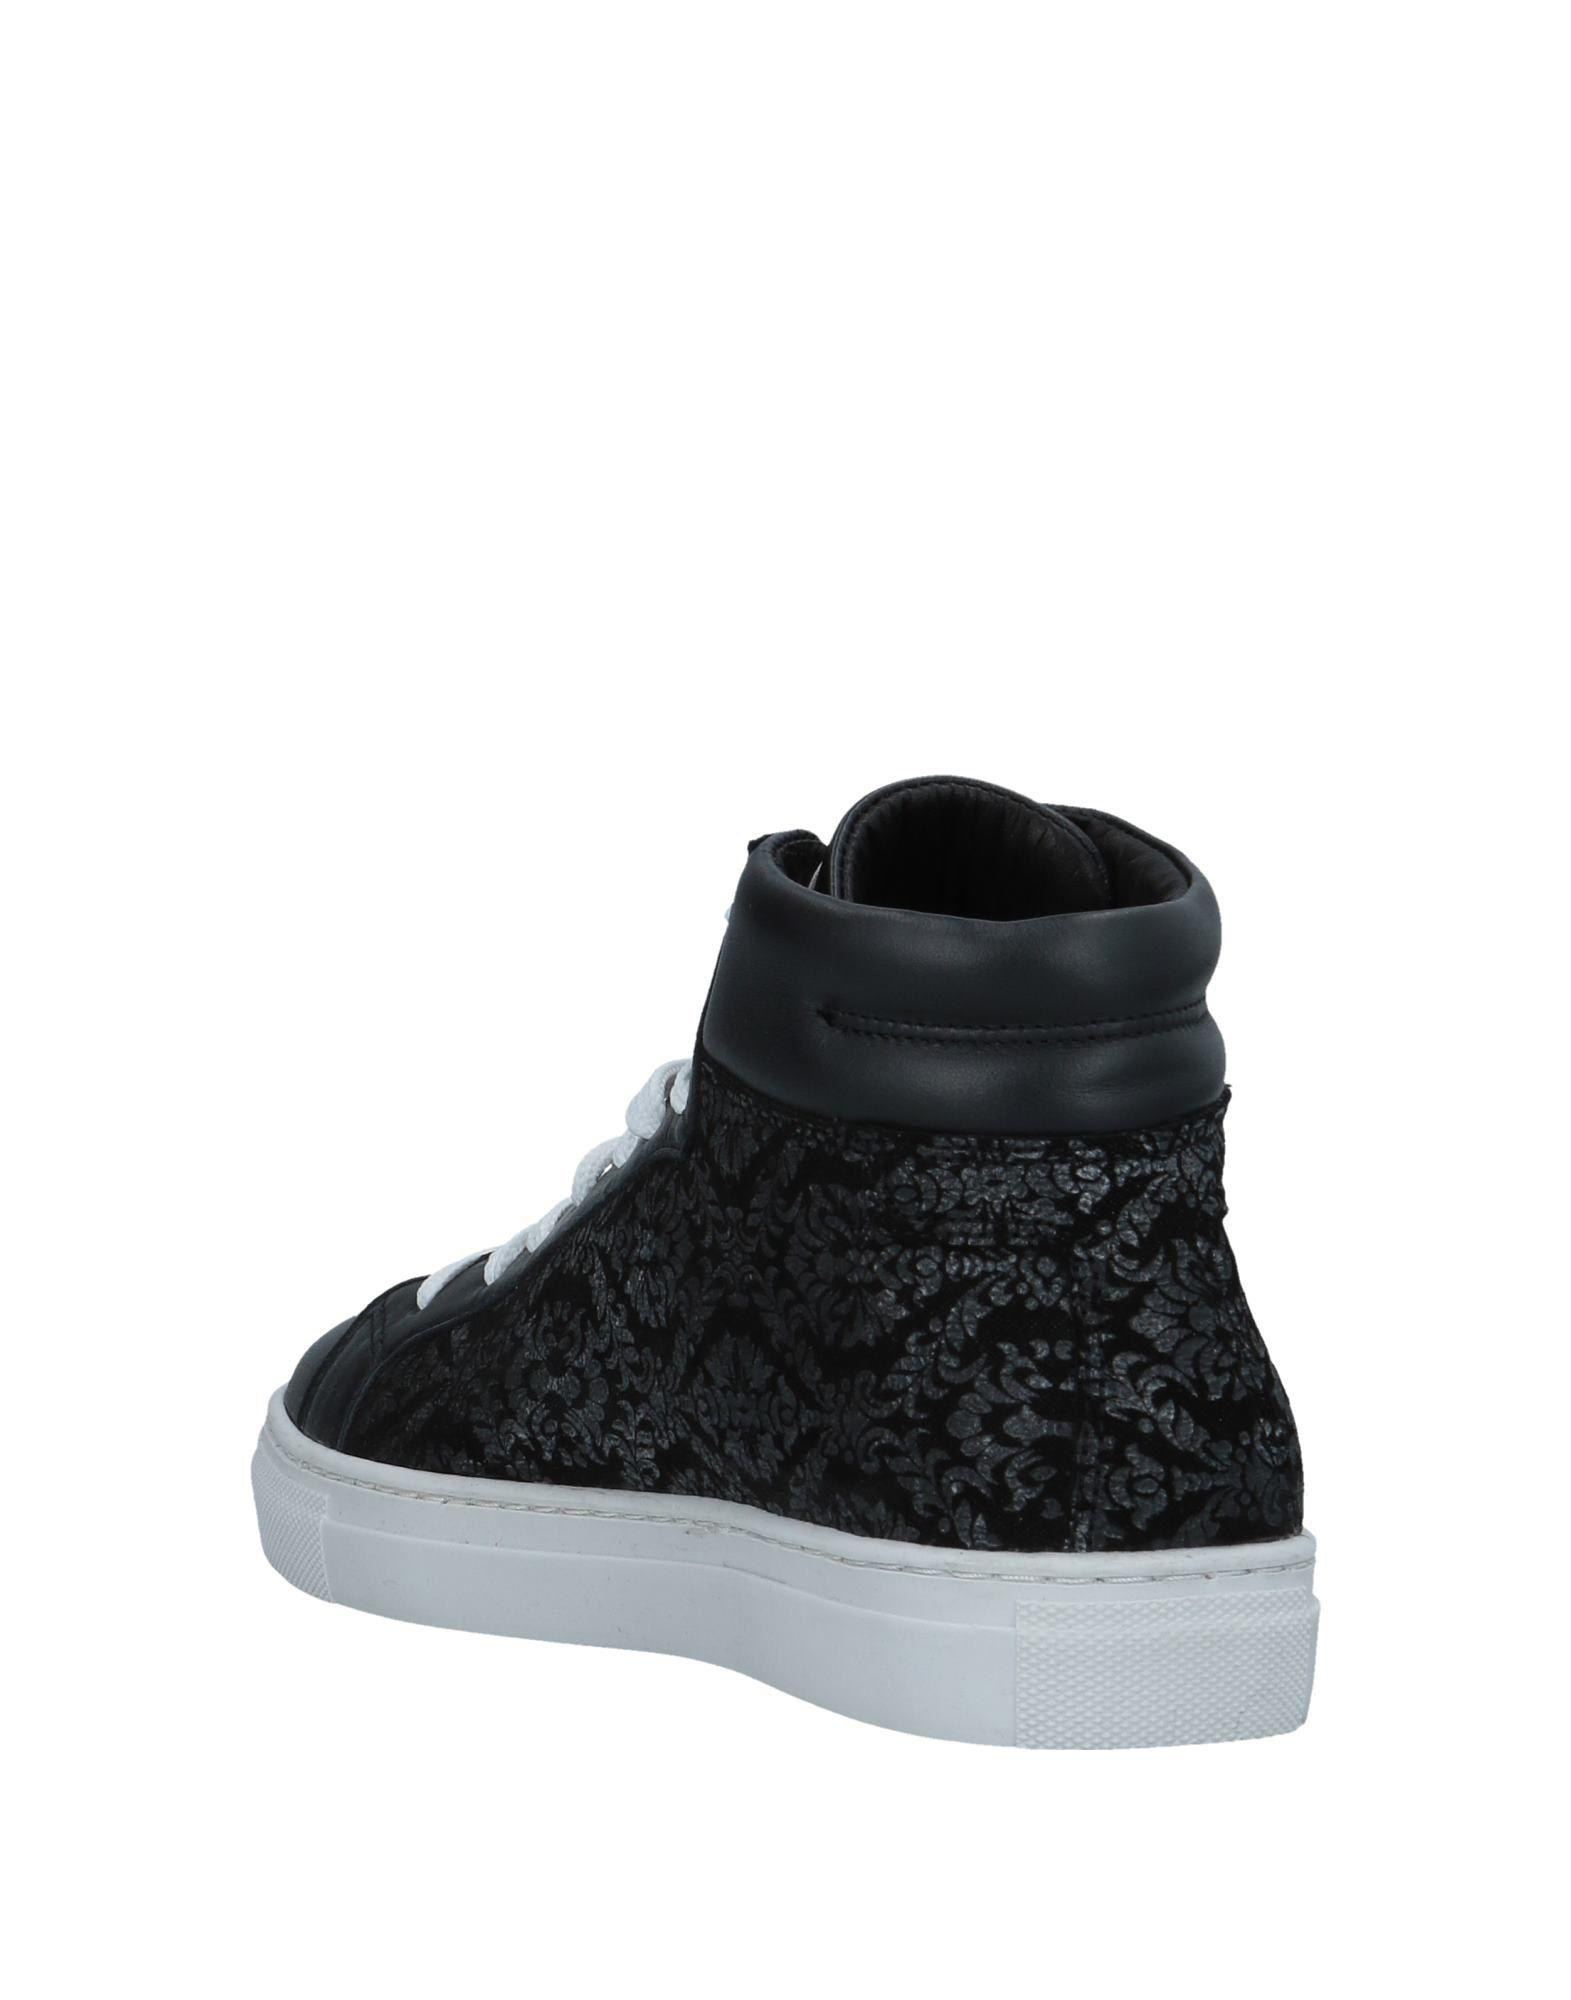 WOMSH Suede High-tops & Sneakers in Black